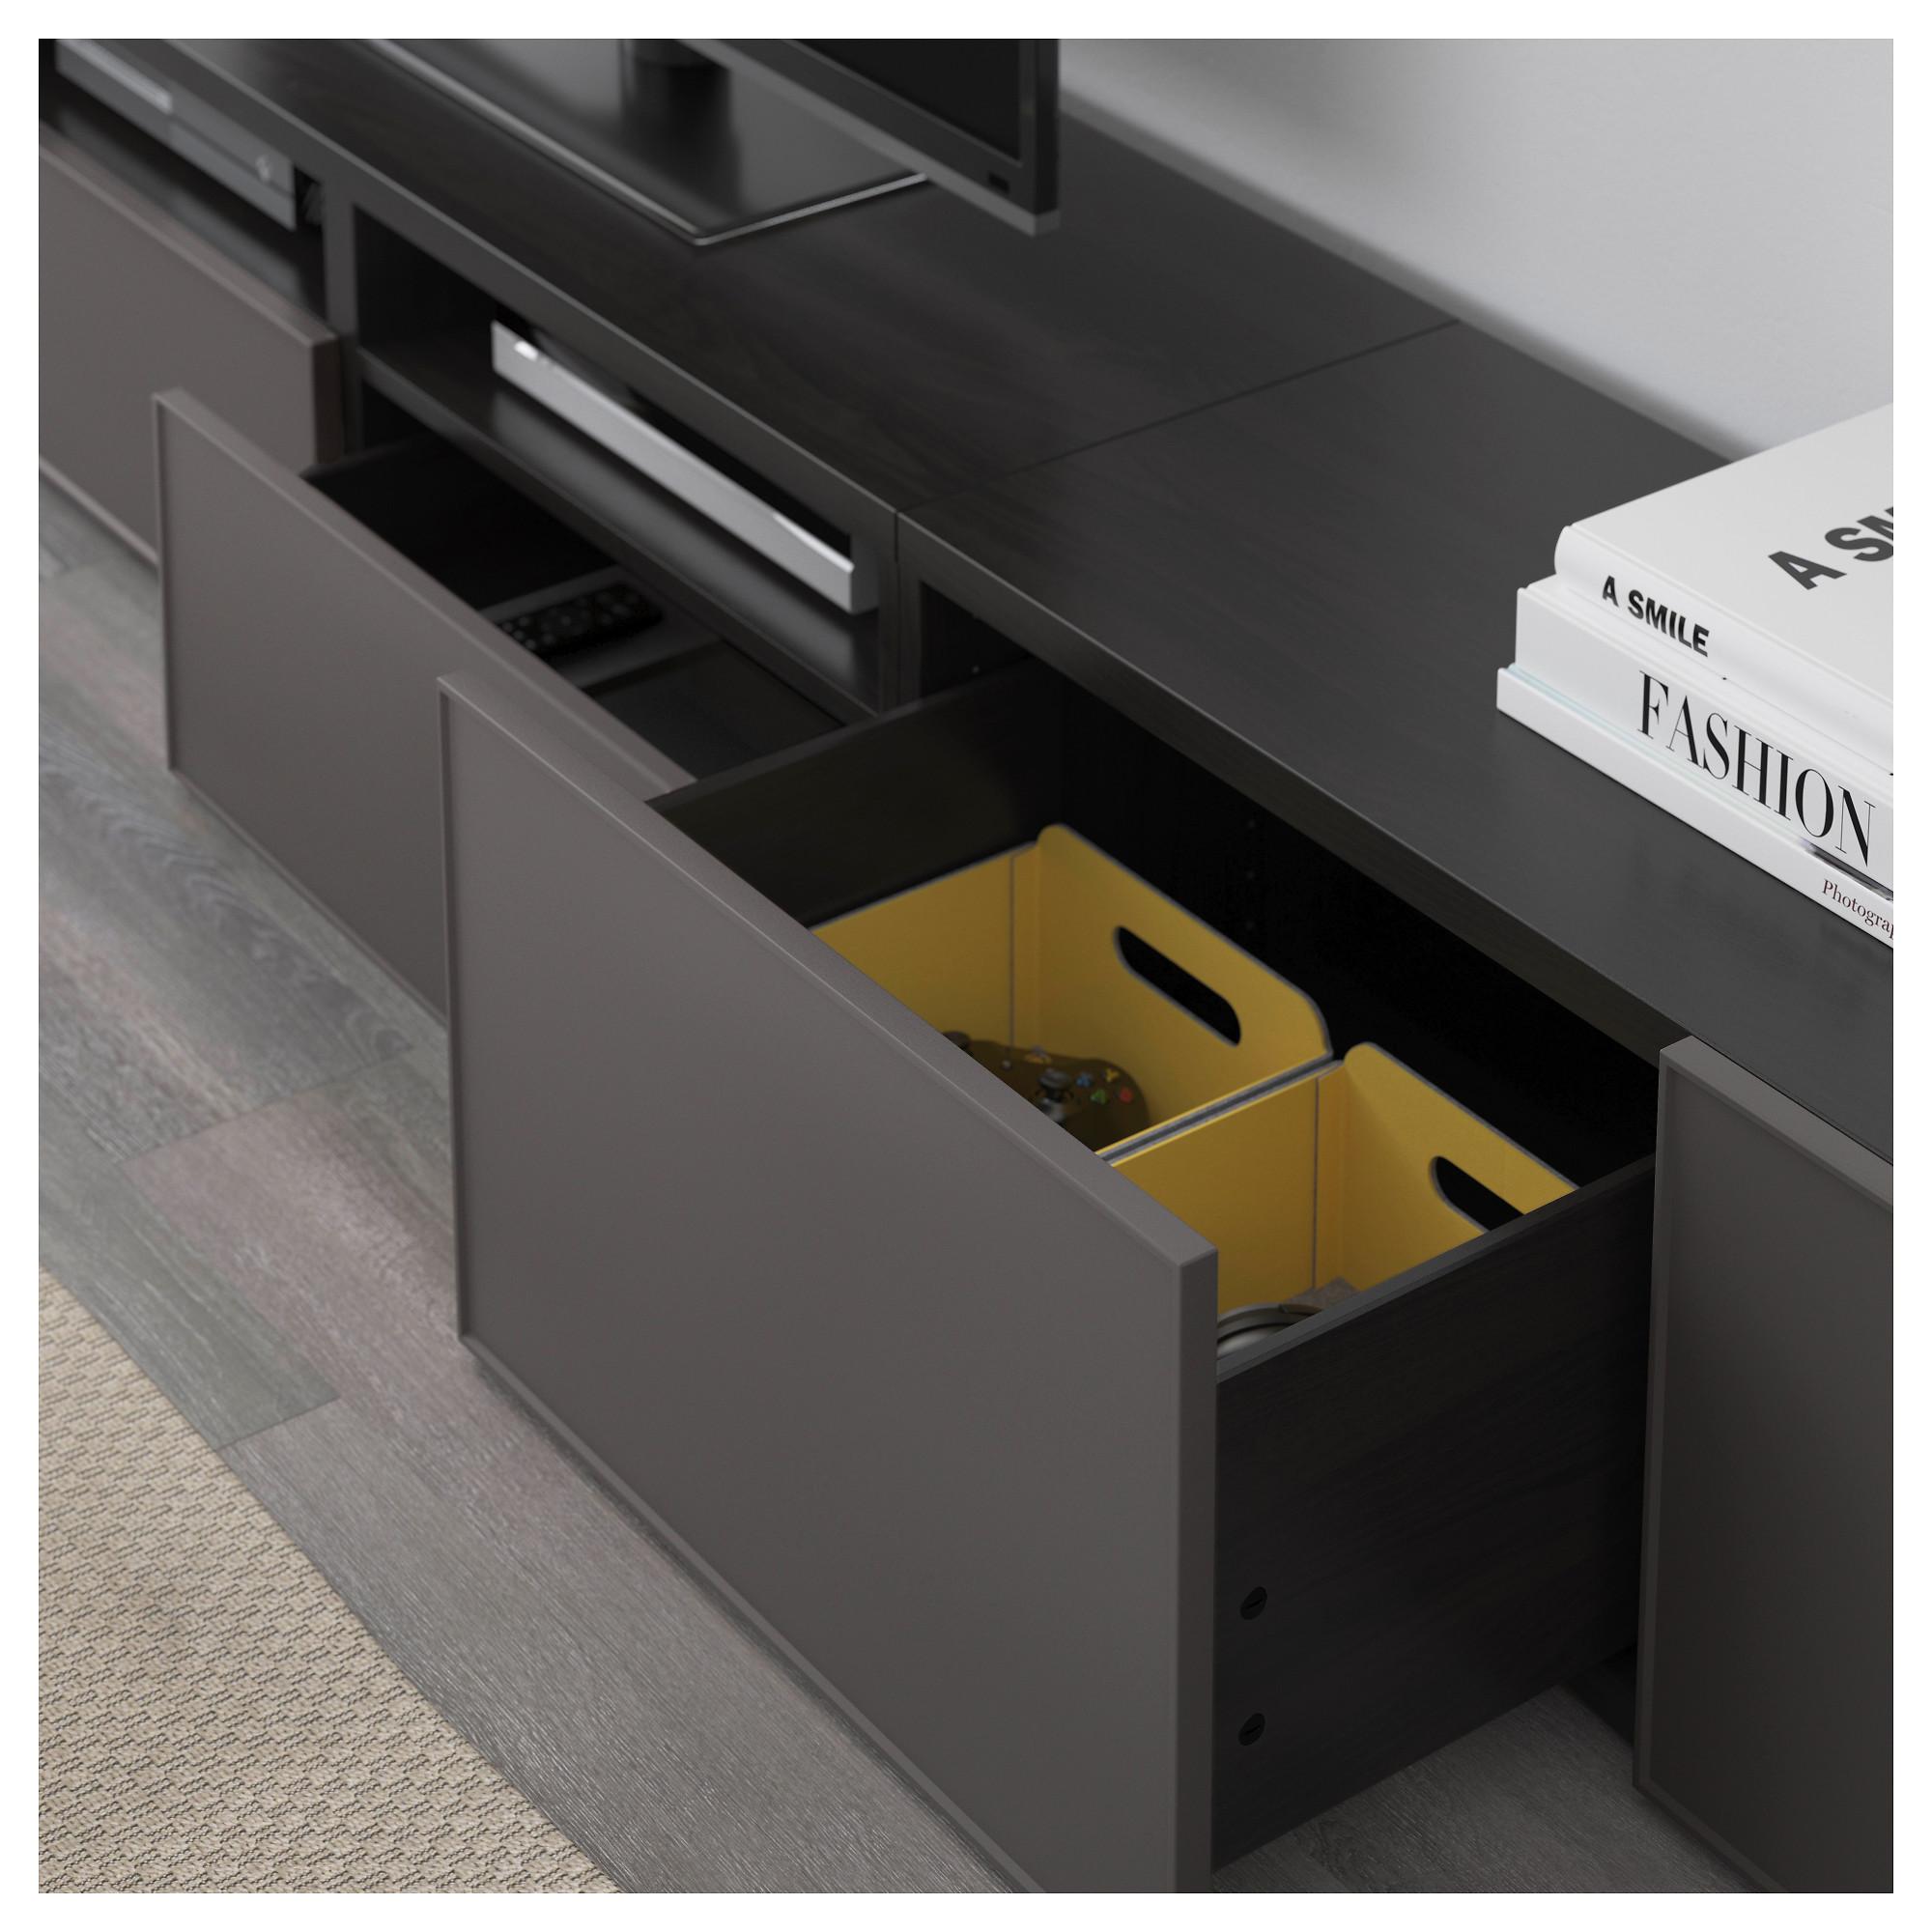 Шкаф для ТВ, комбинация БЕСТО темно-серый артикуль № 892.516.41 в наличии. Онлайн магазин ИКЕА РБ. Недорогая доставка и монтаж.